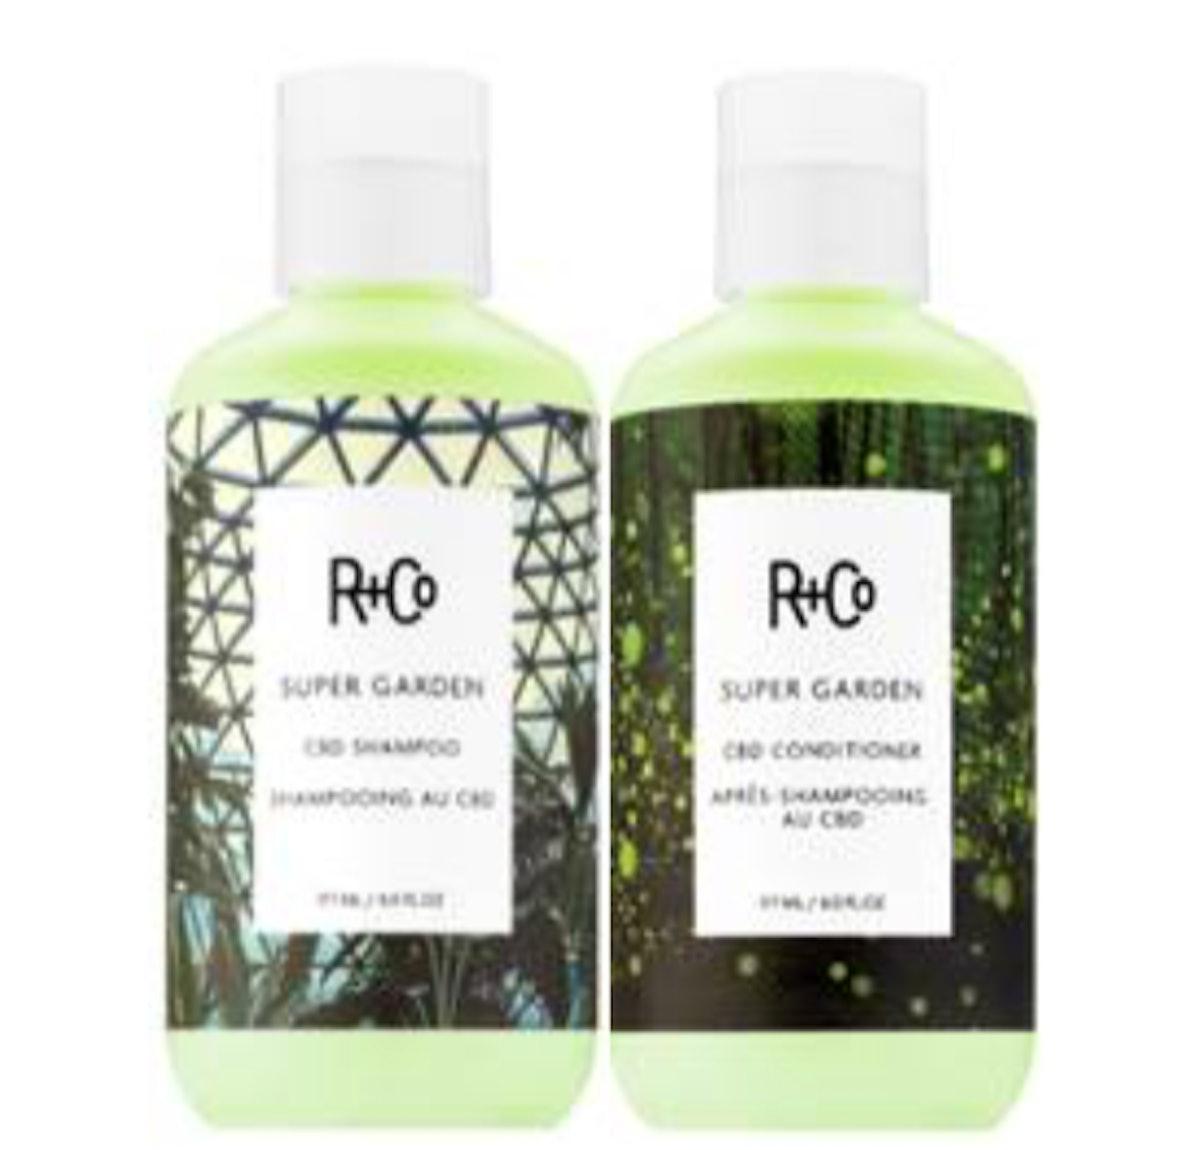 Super Garden CBD Shampoo + Conditioner